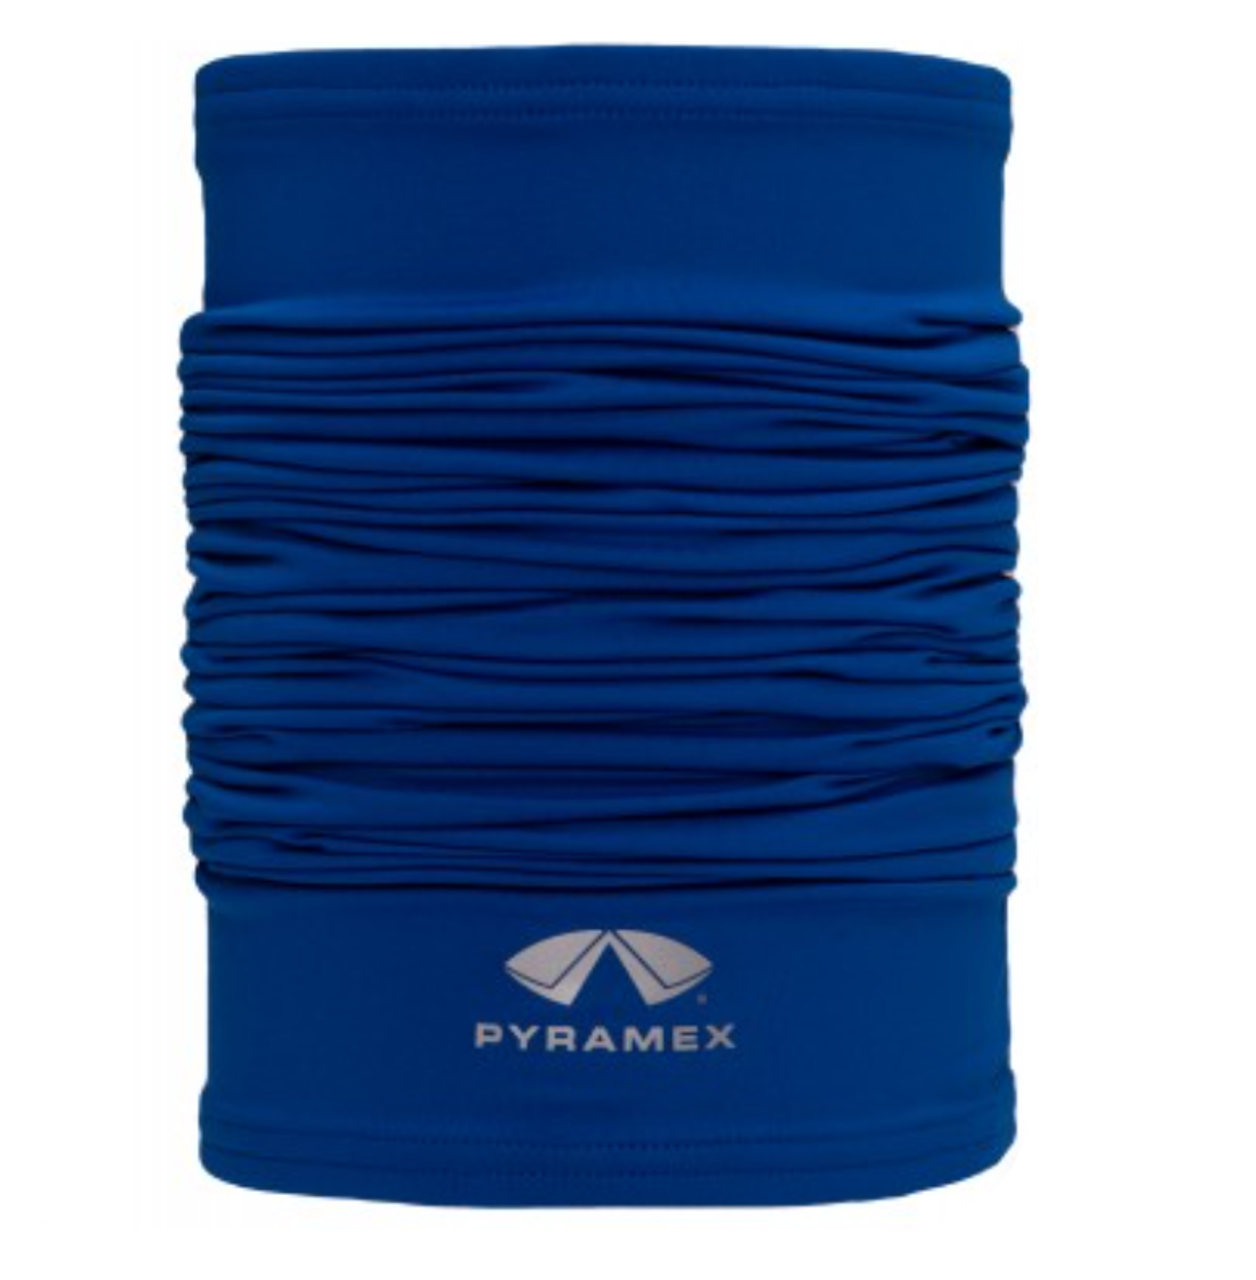 Pyramex MPBDL60 Double-Layer Multi Purpose Mask, Blue (Qty. 1)